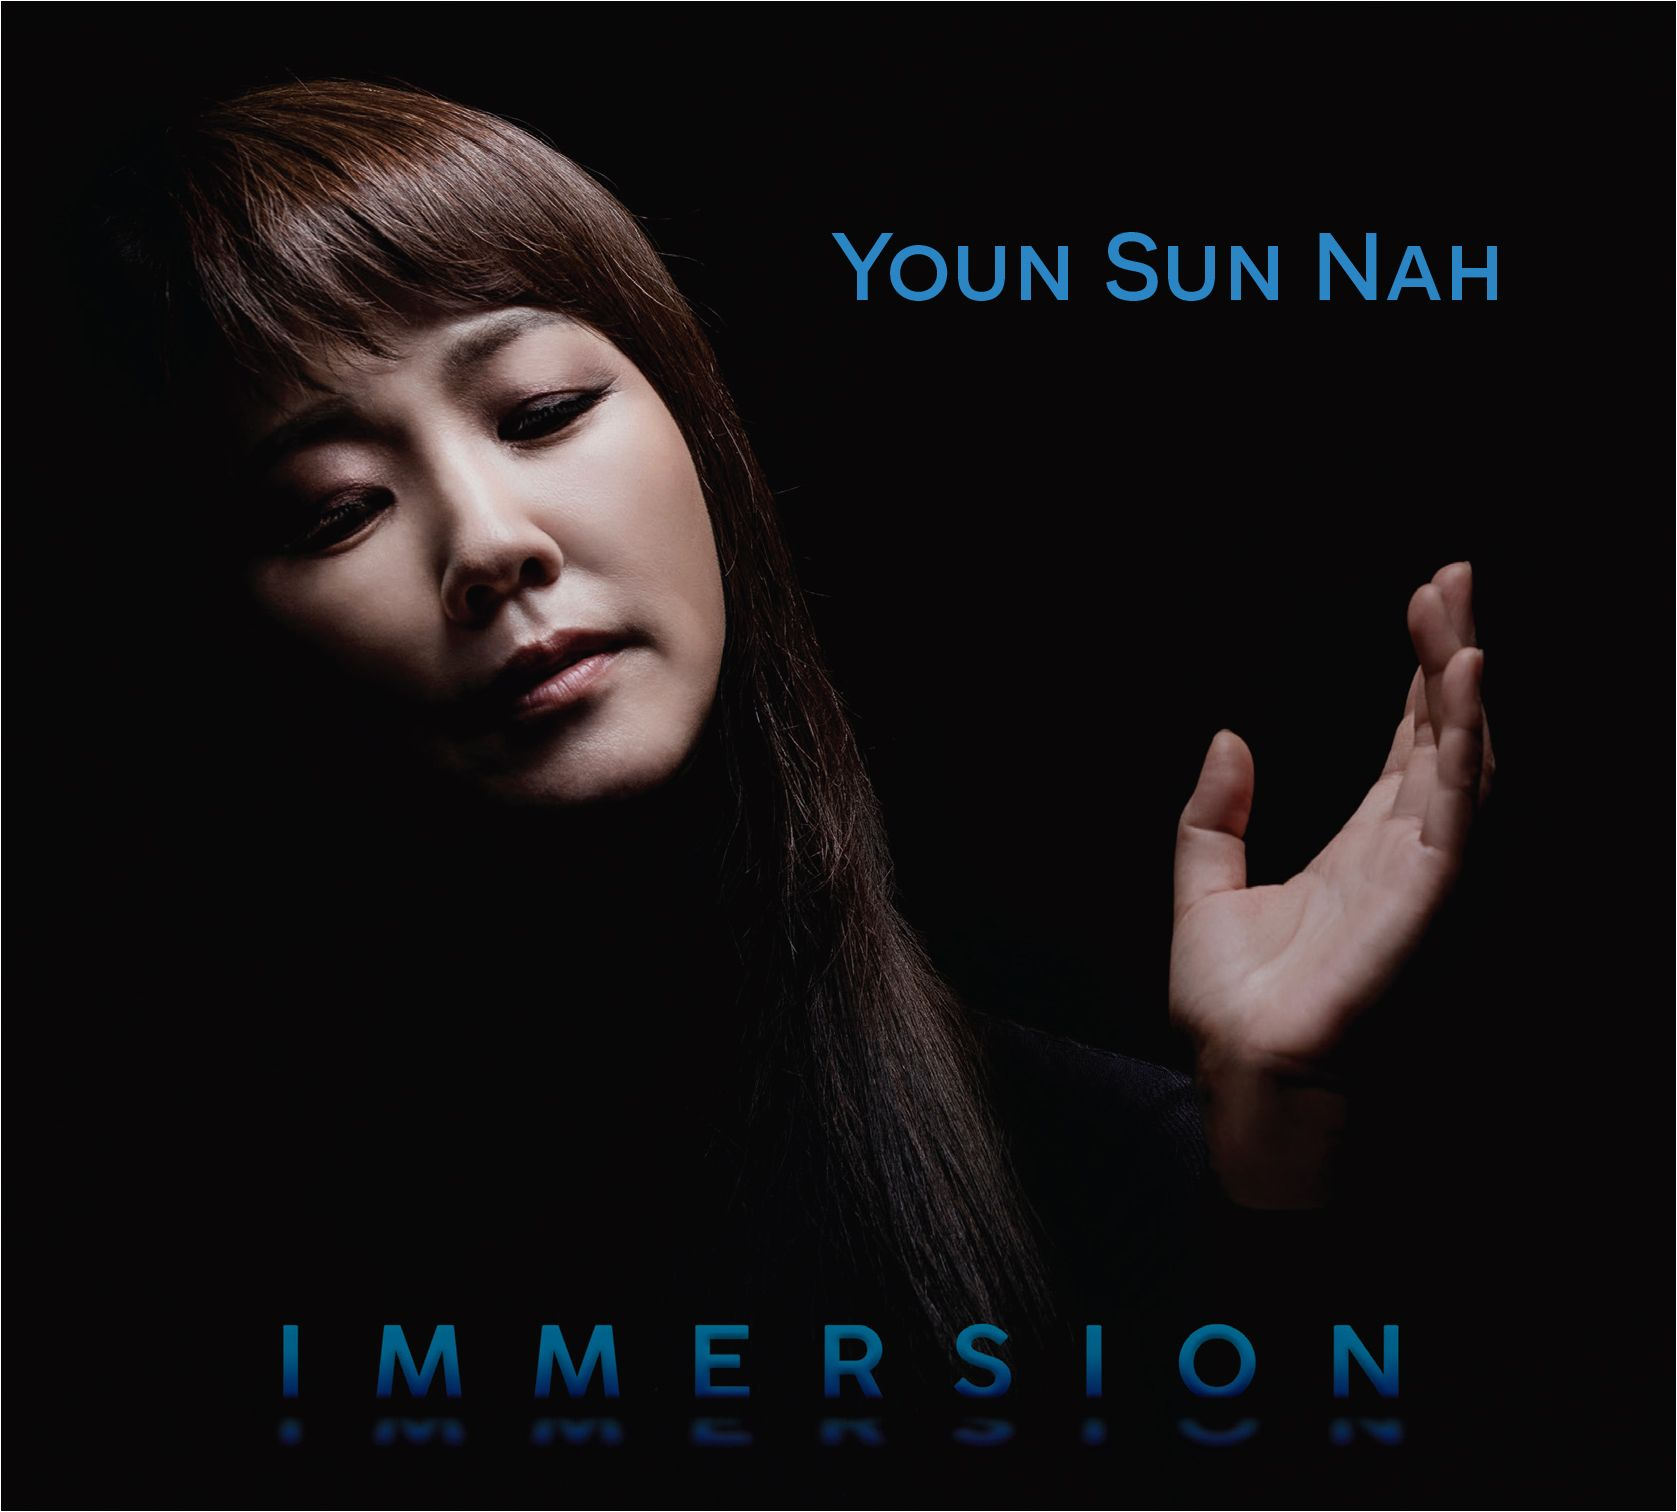 Youn Sun Nah - Immersion album cover